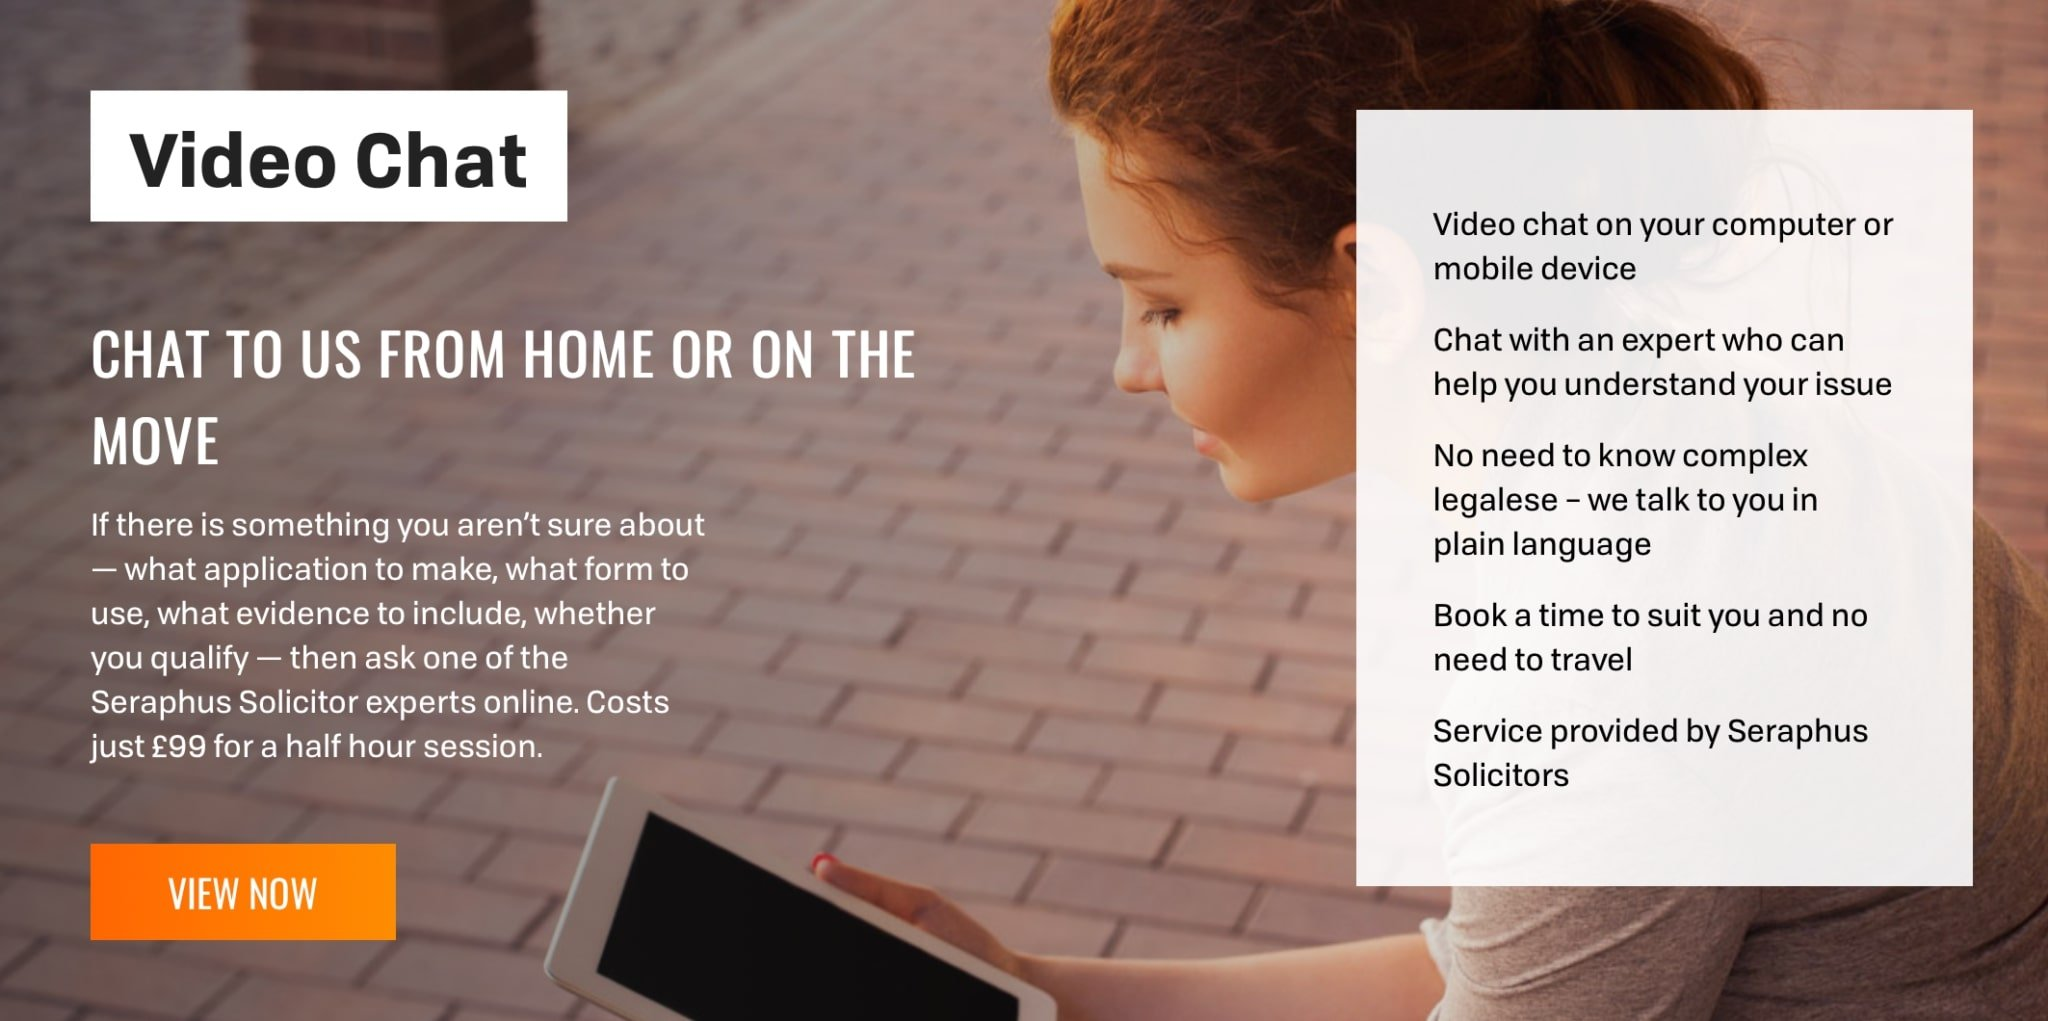 Video-chat-screenshot